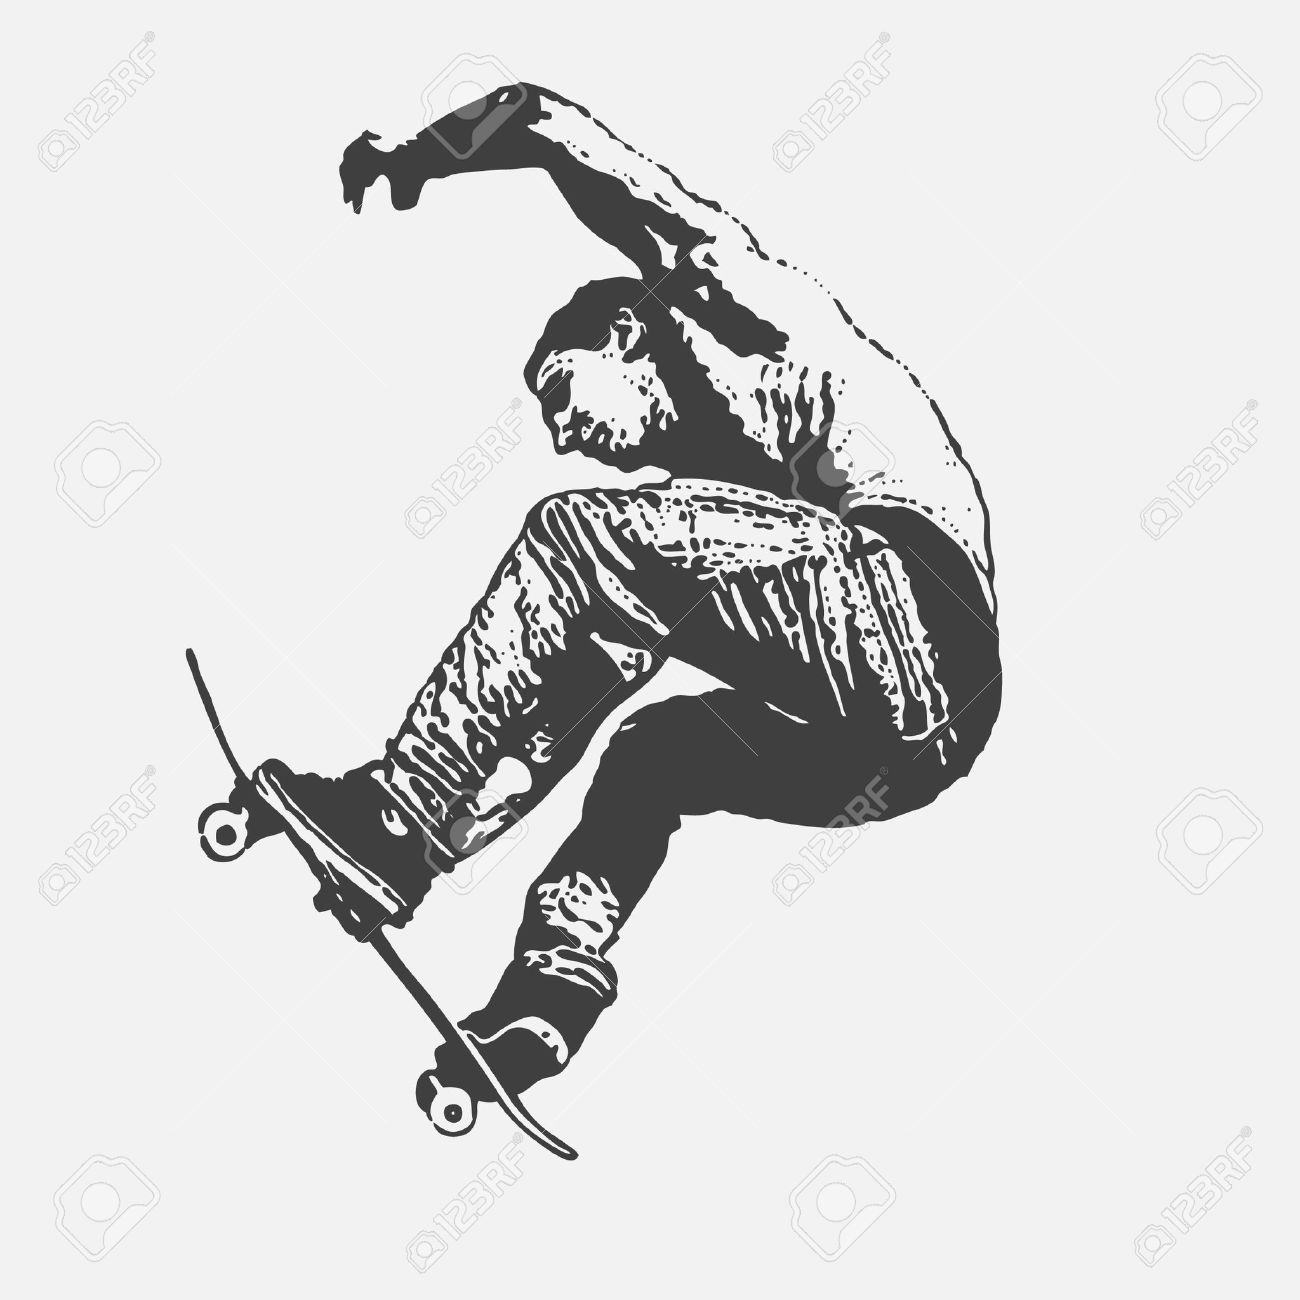 Boy jumping on a skateboard graffiti style vector illustration boy jumping on a skateboard graffiti style vector illustration stock vector 8920446 altavistaventures Images